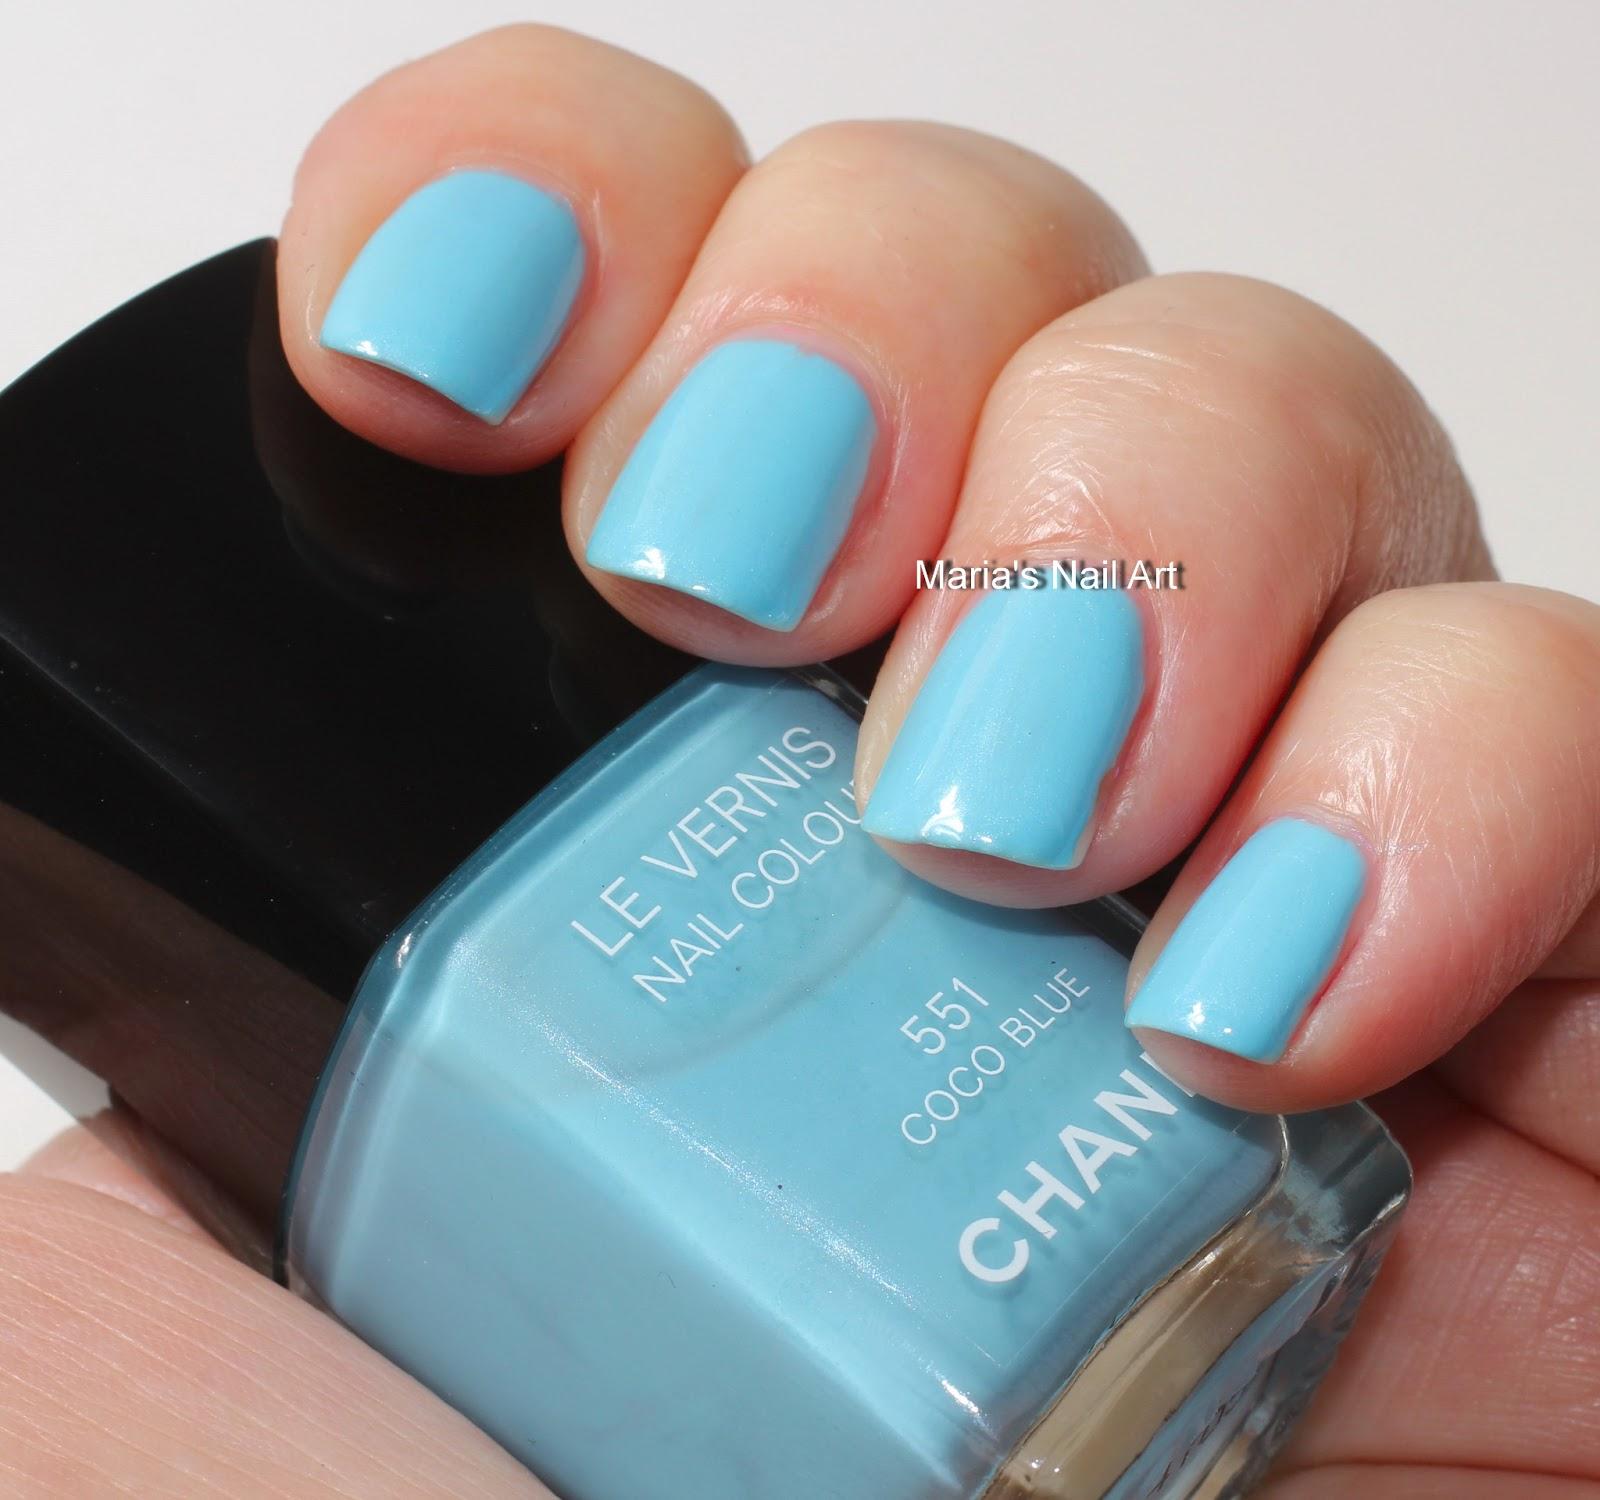 Marias Nail Art and Polish Blog: Chanel Coco Blue 551 - Les Jeans ...